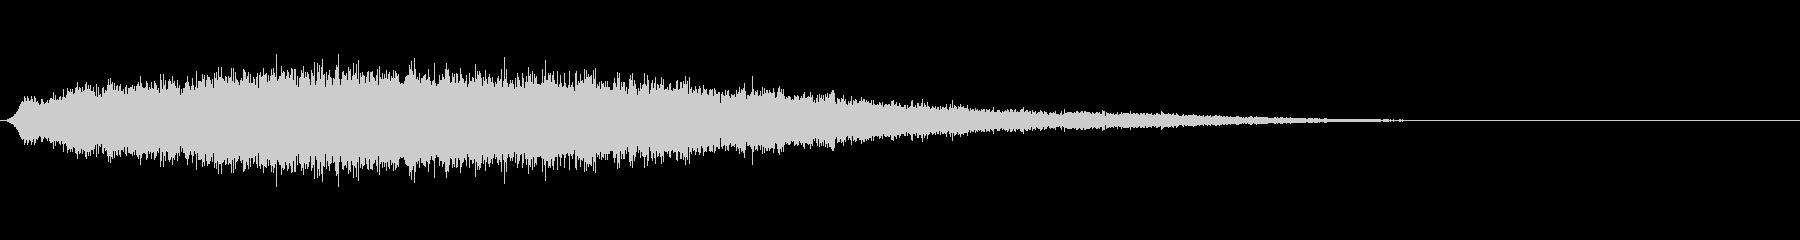 Symphonic、Slow Do...の未再生の波形